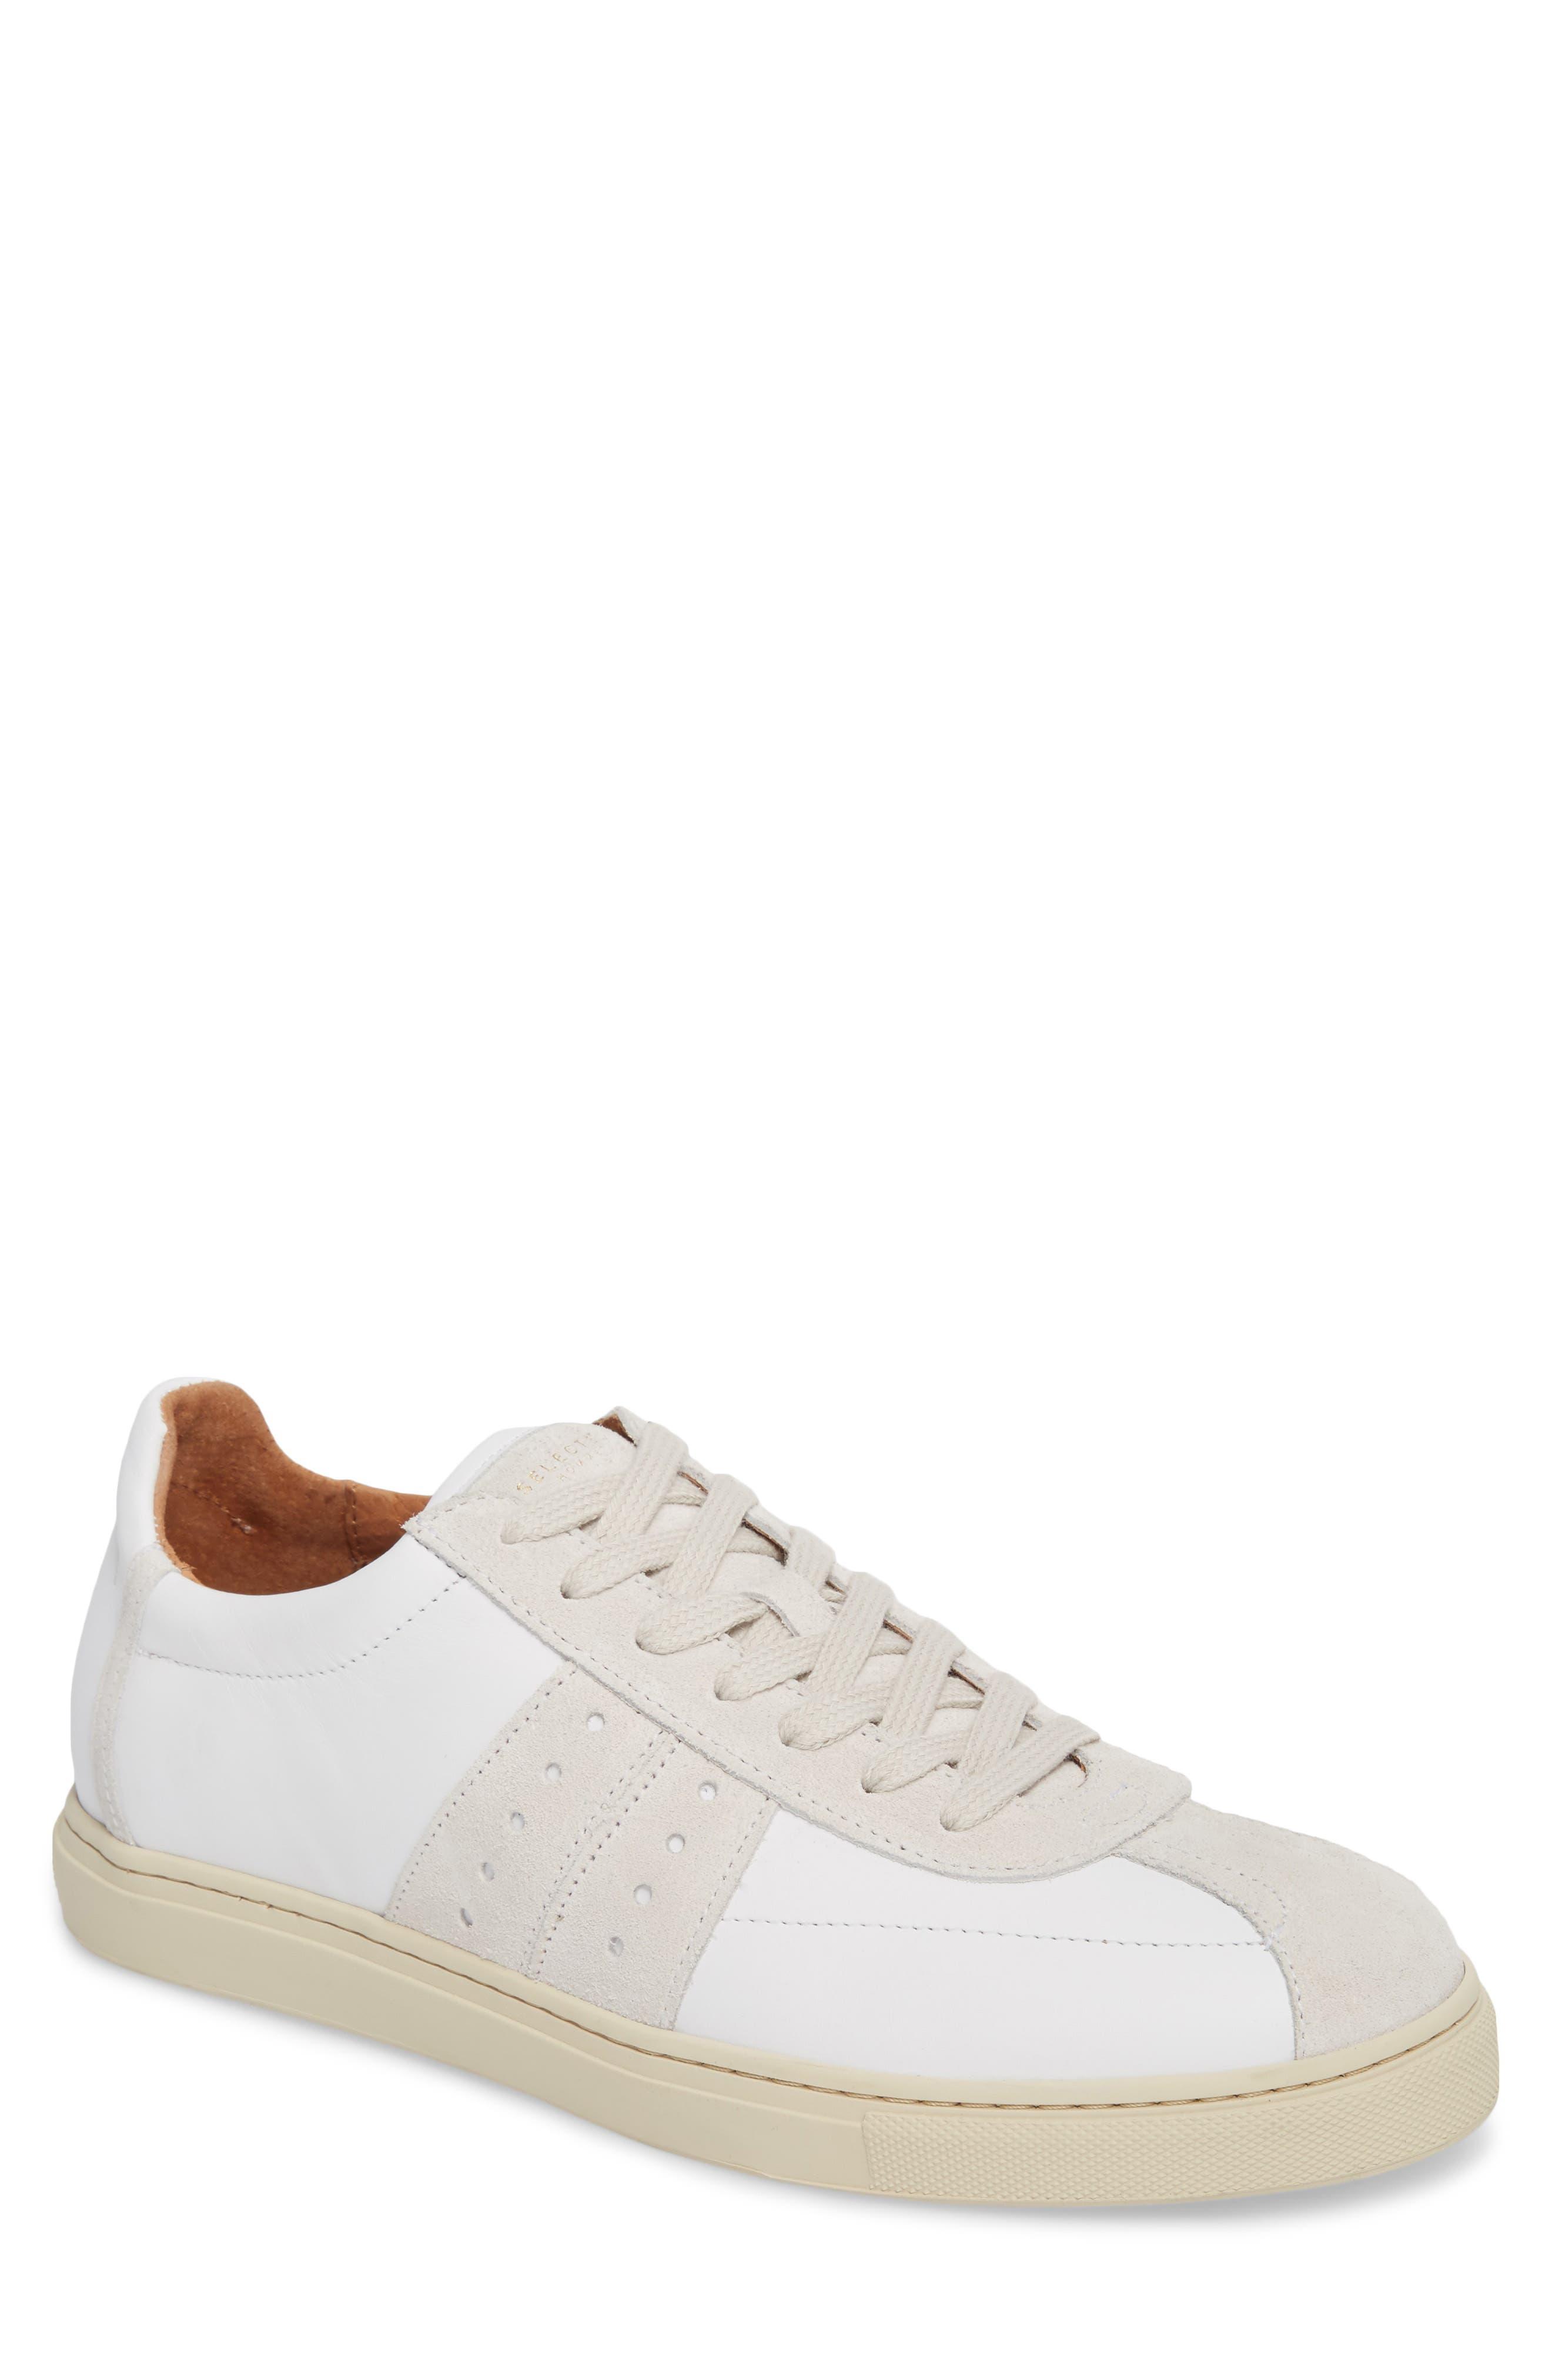 Duran New Mix Sneaker,                             Main thumbnail 1, color,                             100